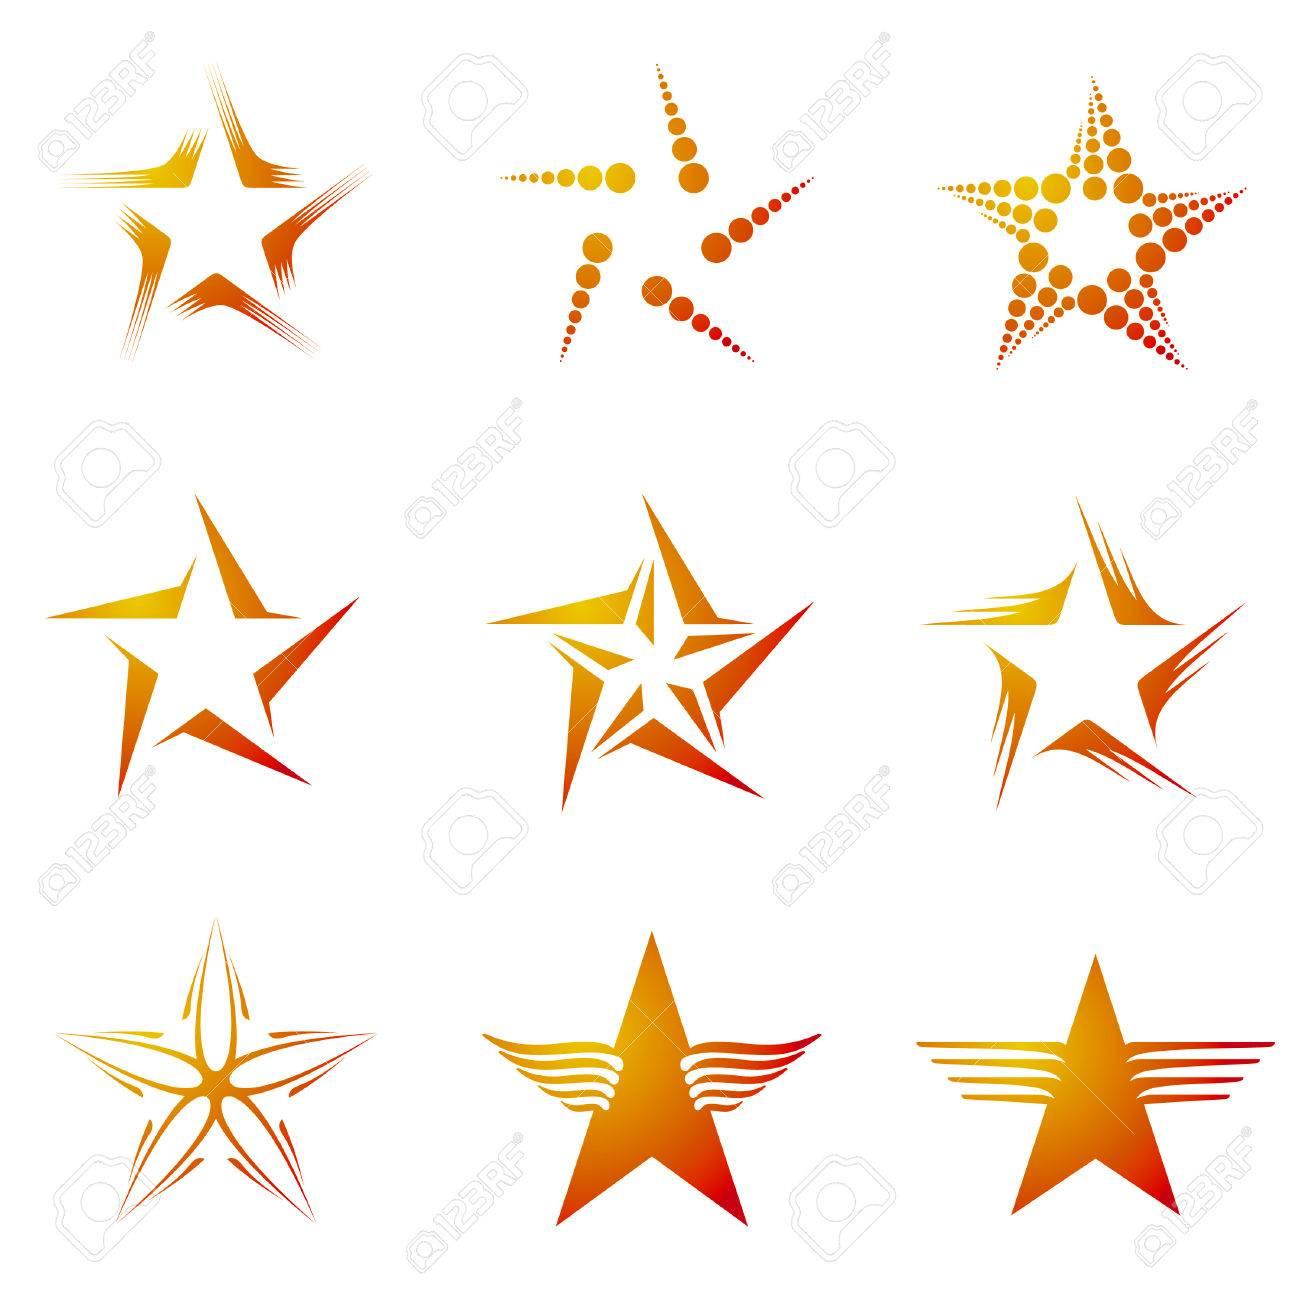 Set of decorative and creative five cornered/pentagonal stars Stock Vector - 4092677